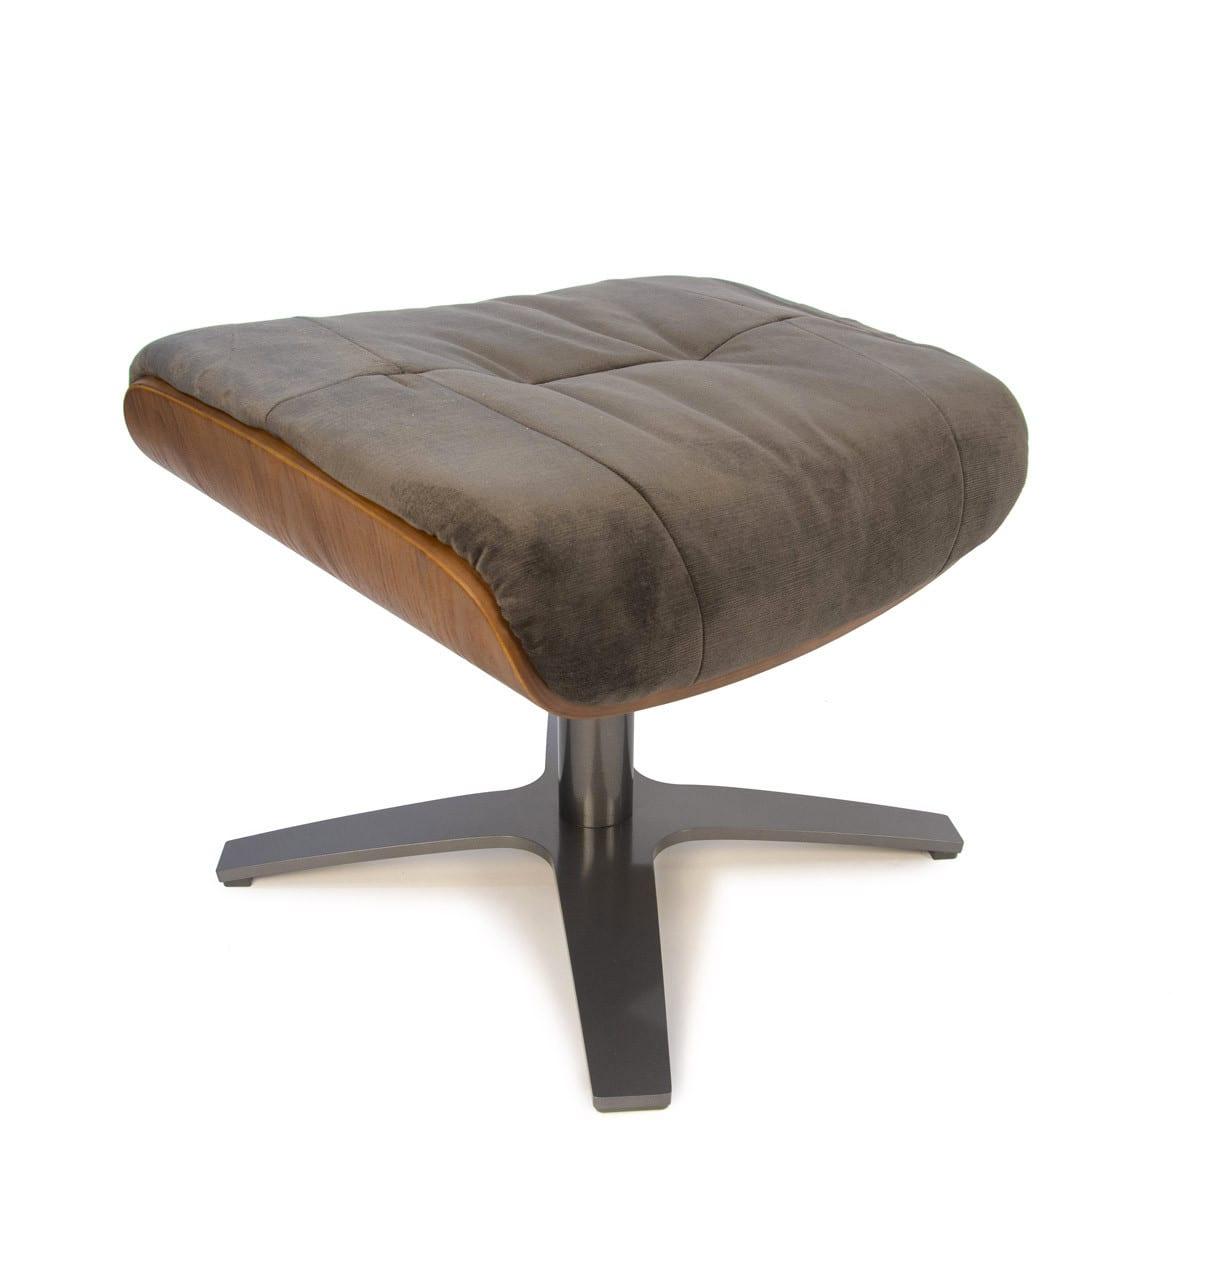 Repose-pieds de relaxation velours brun et chêne naturel